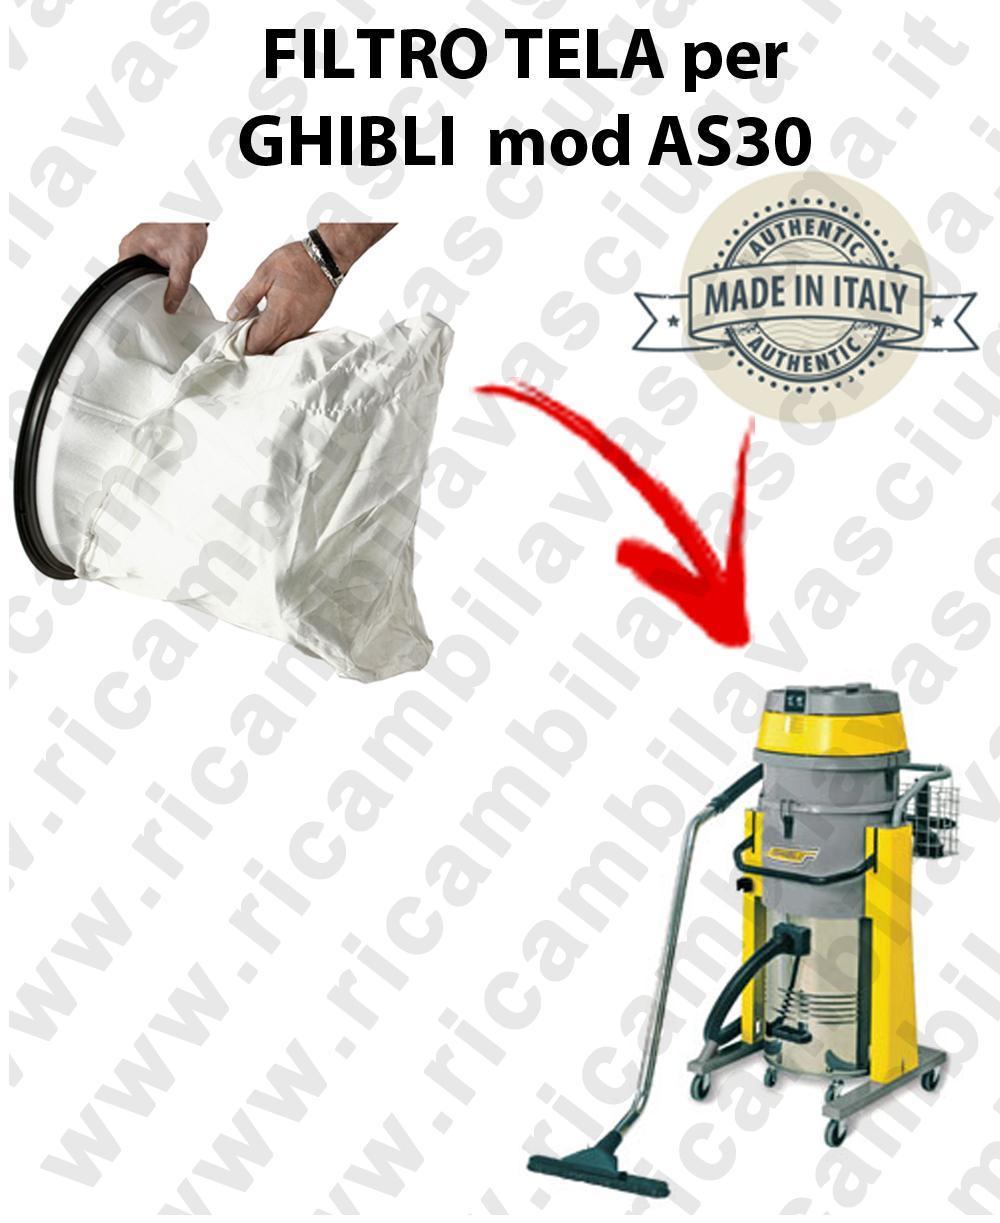 SACCO Filtro de Nylon cod: 3001220 para aspiradora GHIBLI Model AS30